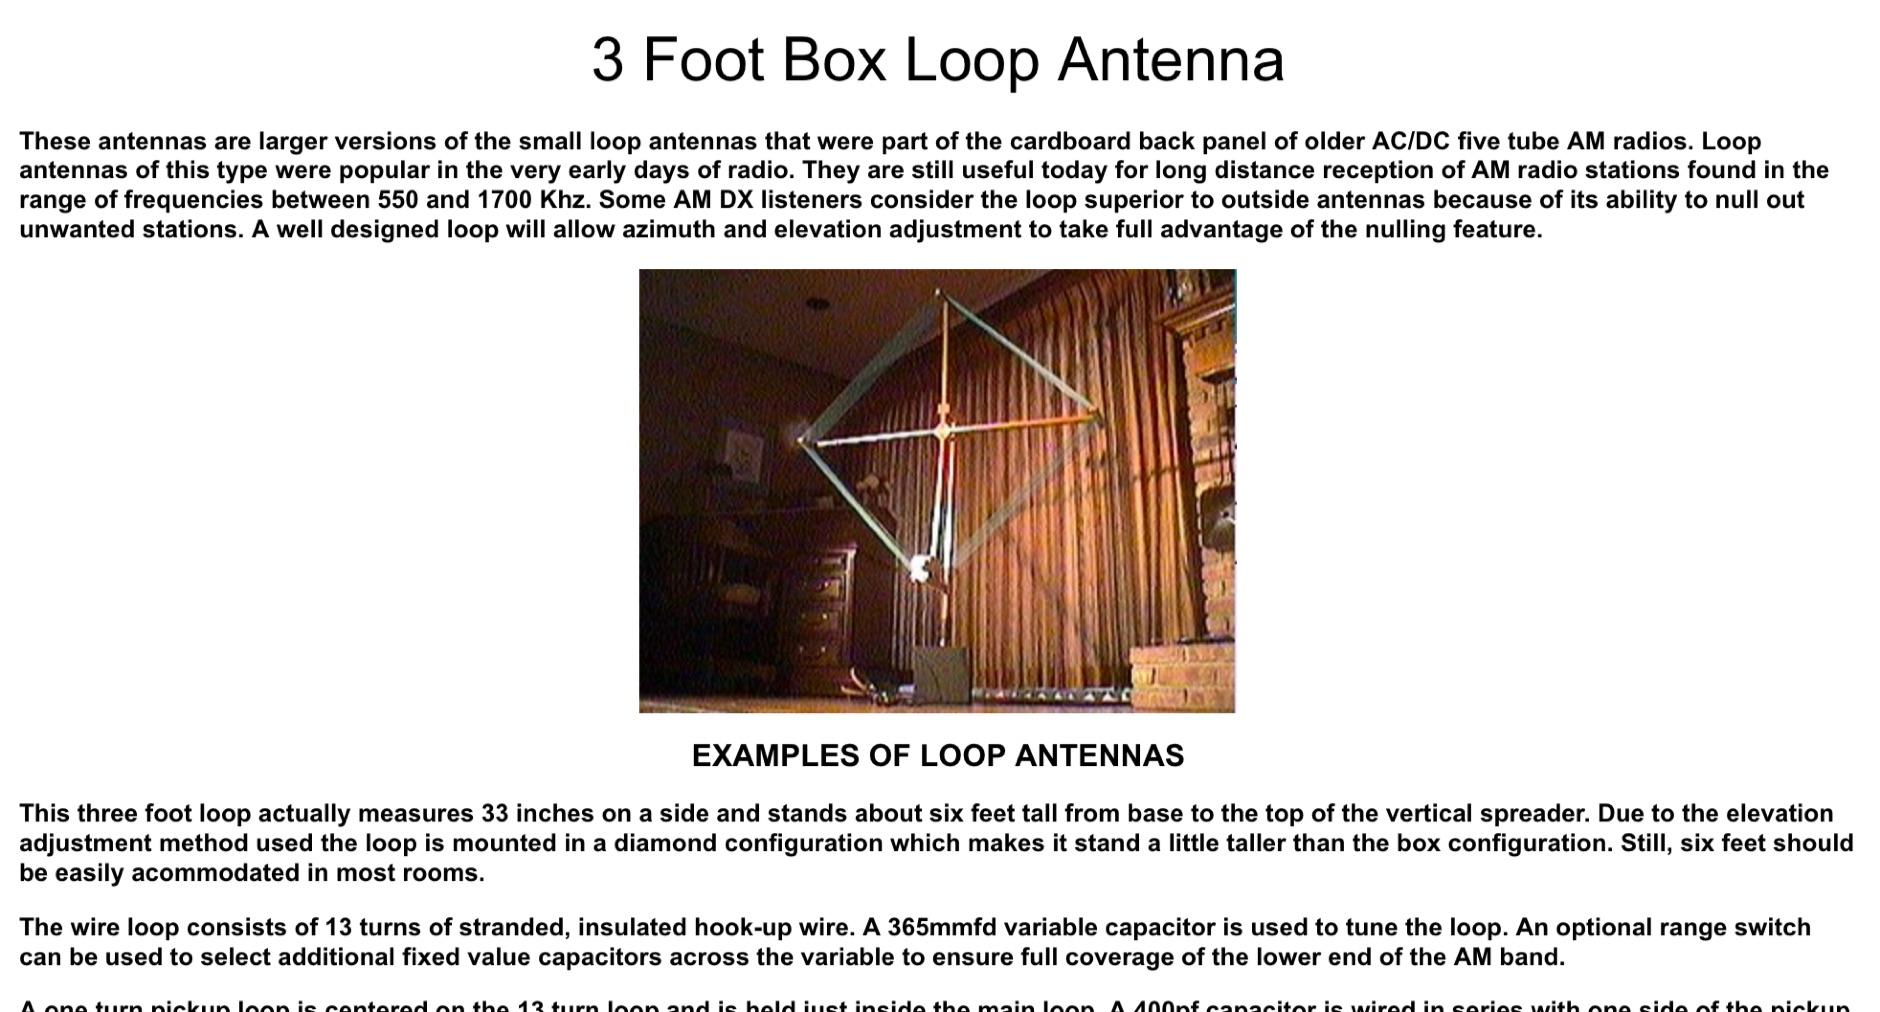 3 Foot Box Loop Antenna